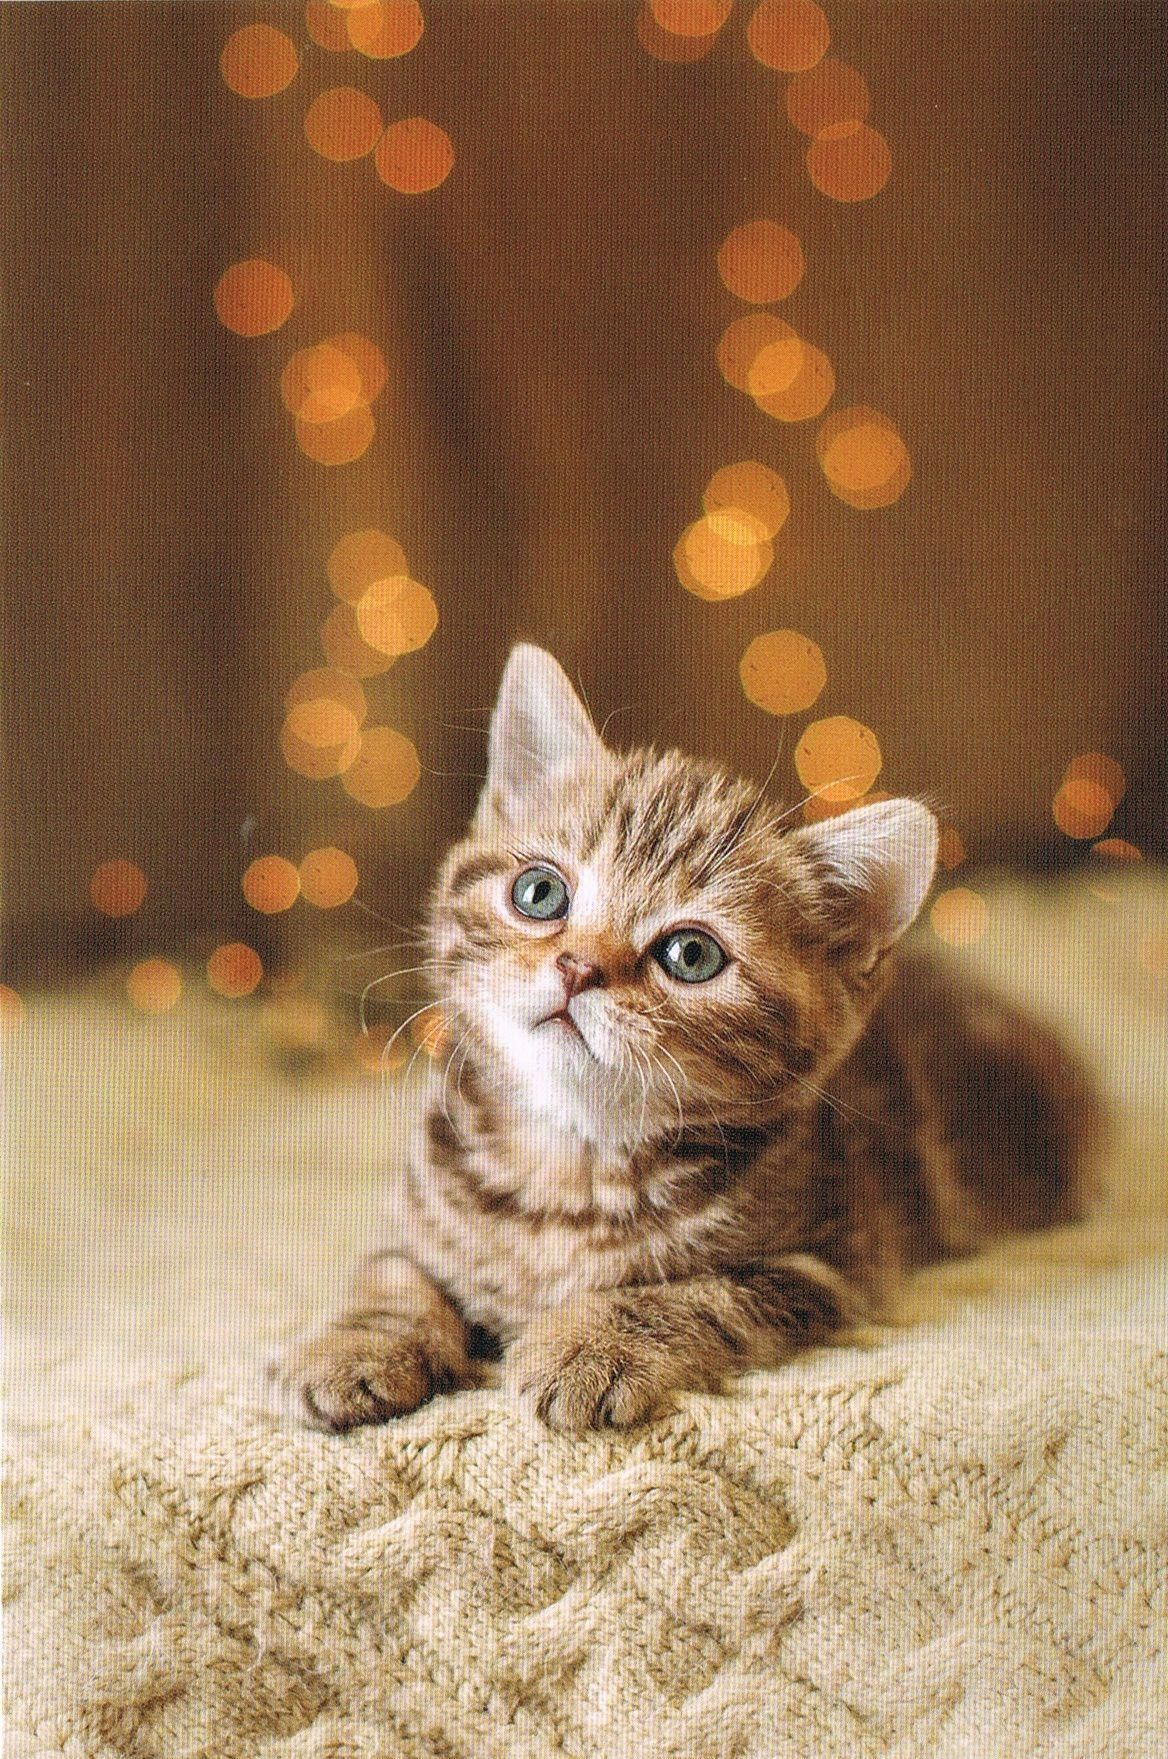 Cat Litter Box Size Cat Door Ideas Cat Furniture Diy Hidden Cat Litter Box Ideas Diy In 2020 Cute Cats And Dogs Kittens Cutest Pretty Cats